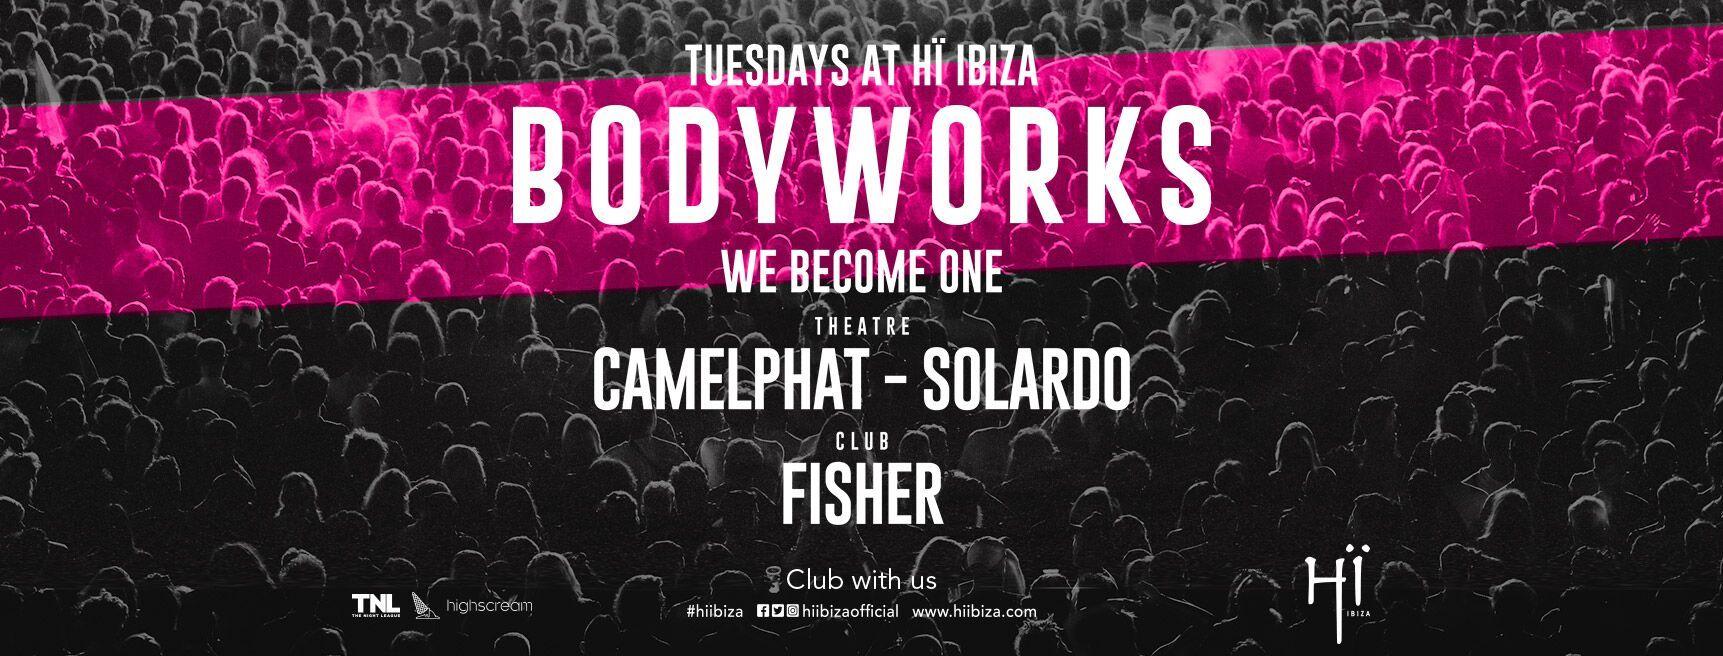 Bodyworks, la nueva residencia de Hï Ibiza